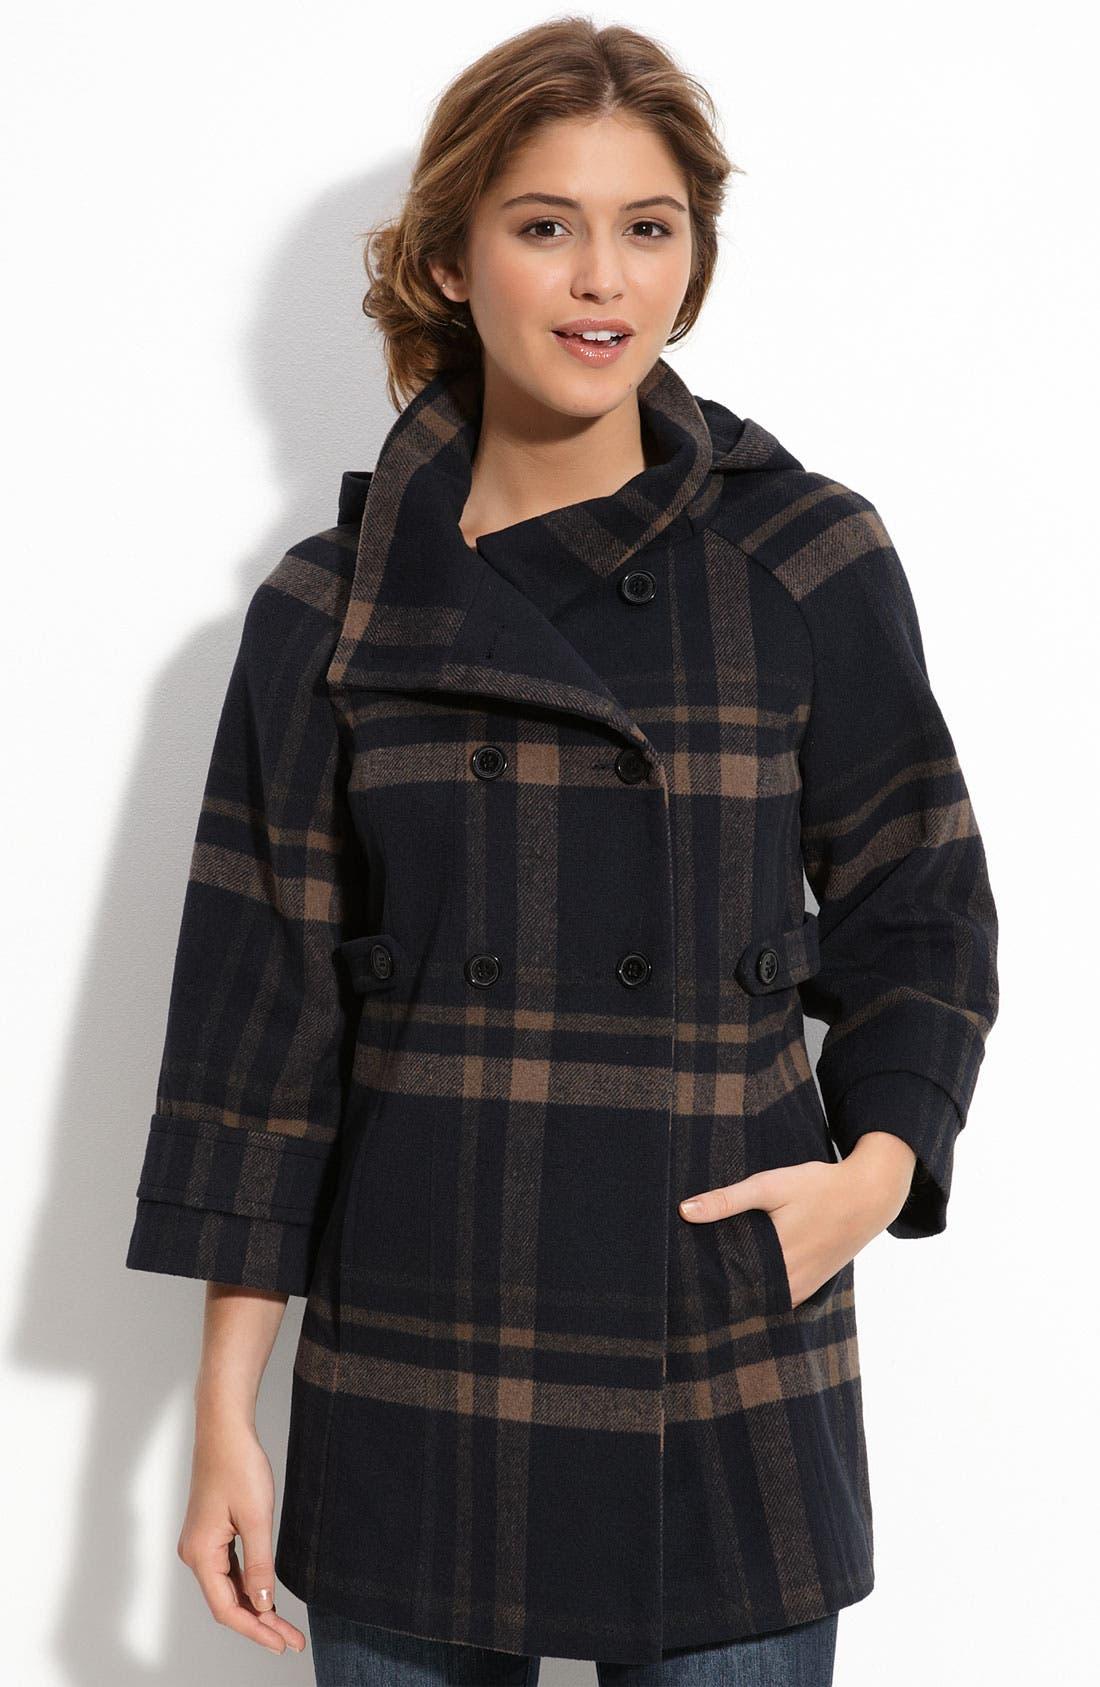 Alternate Image 1 Selected - Jou Jou Plaid Wool Coat (Juniors)